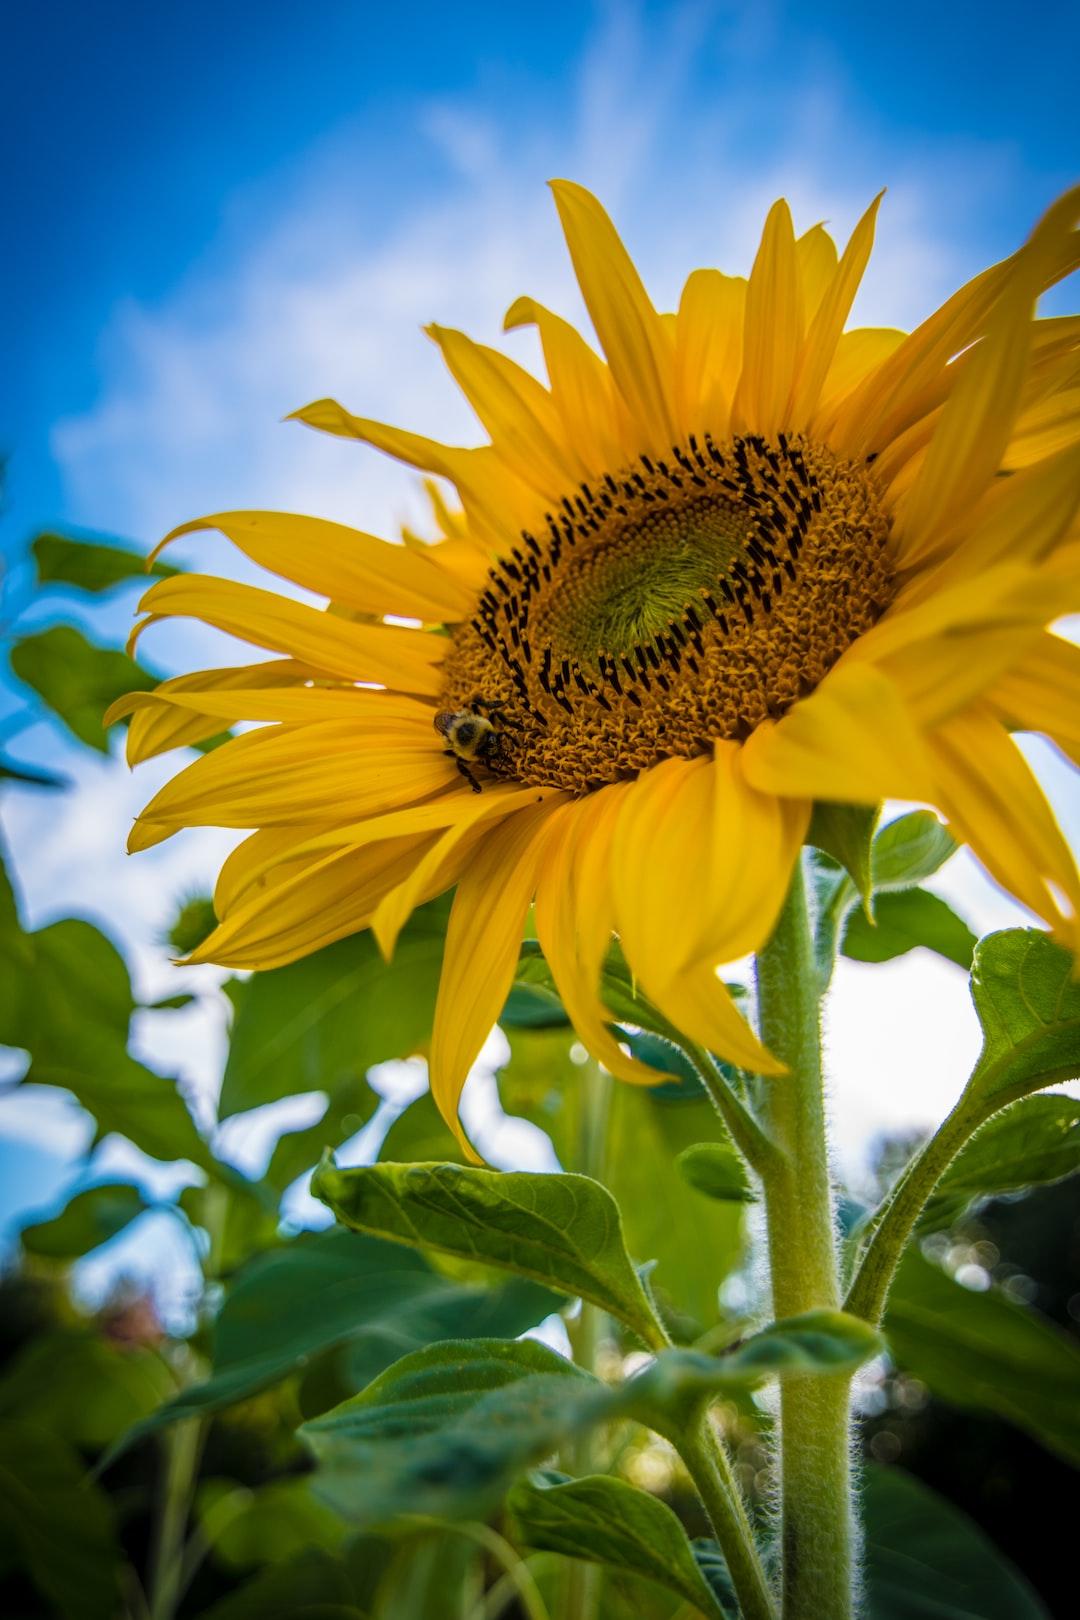 Sunflower Wallpapers: Free HD Download 500+ HQ | Unsplash